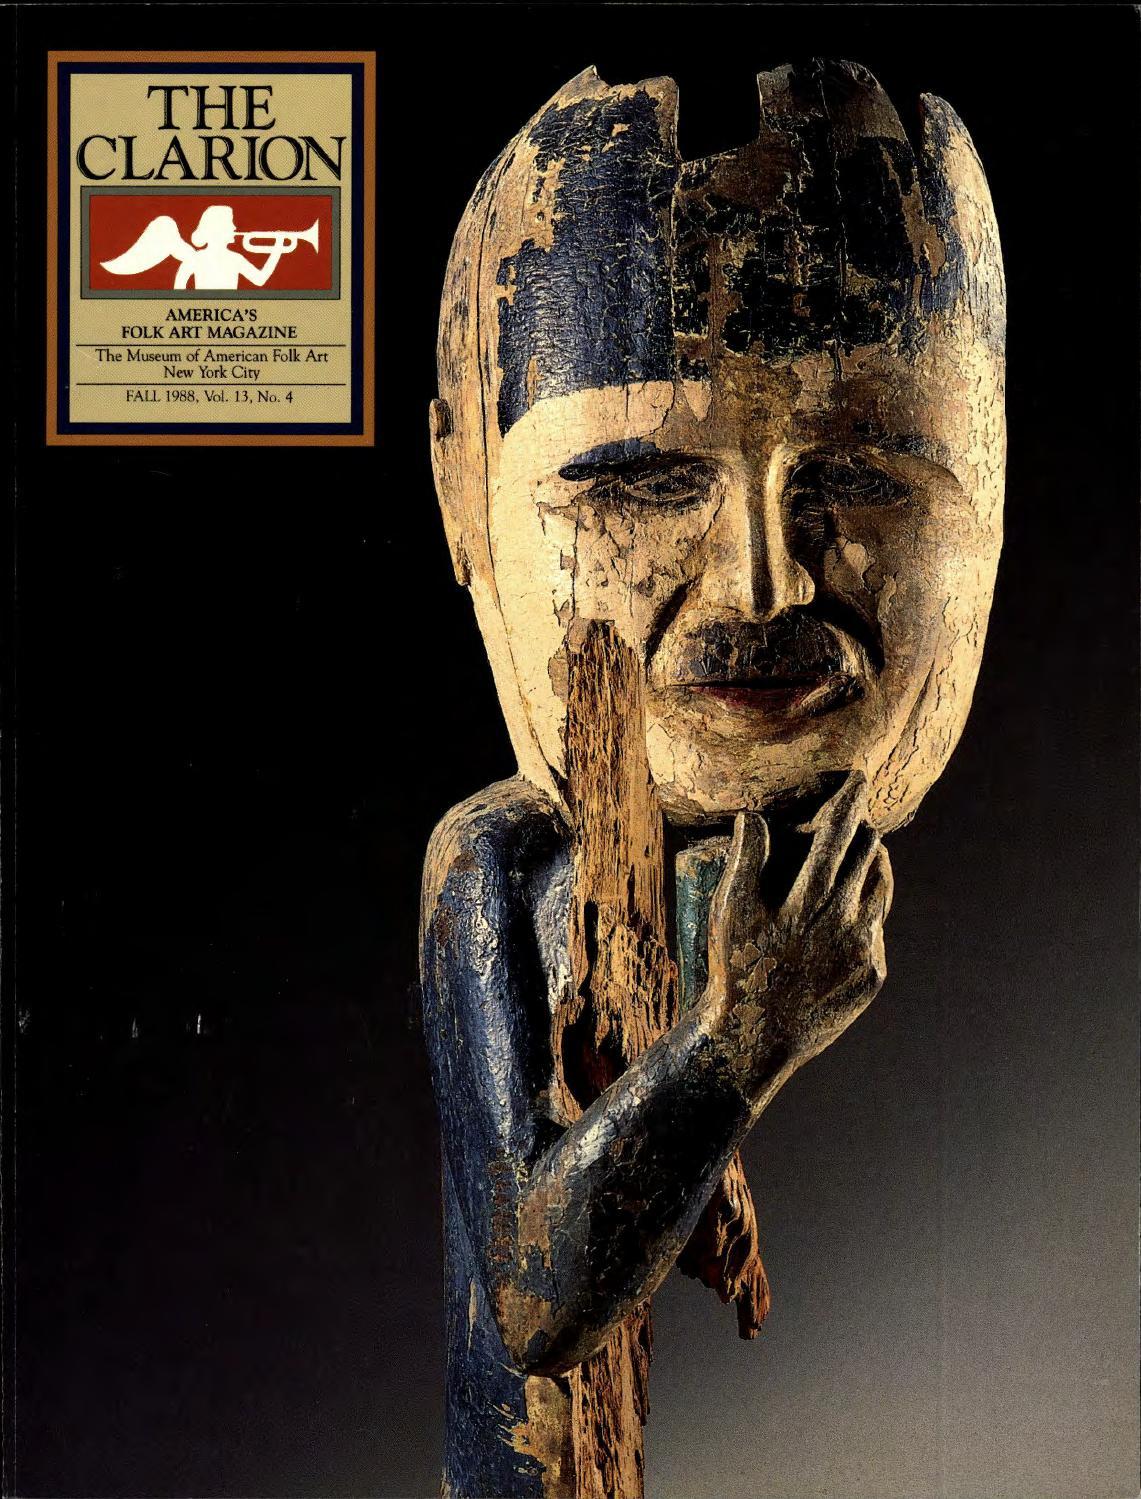 The Clarion (Fall 1988) by American Folk Art Museum - issuu d9486b22eab24